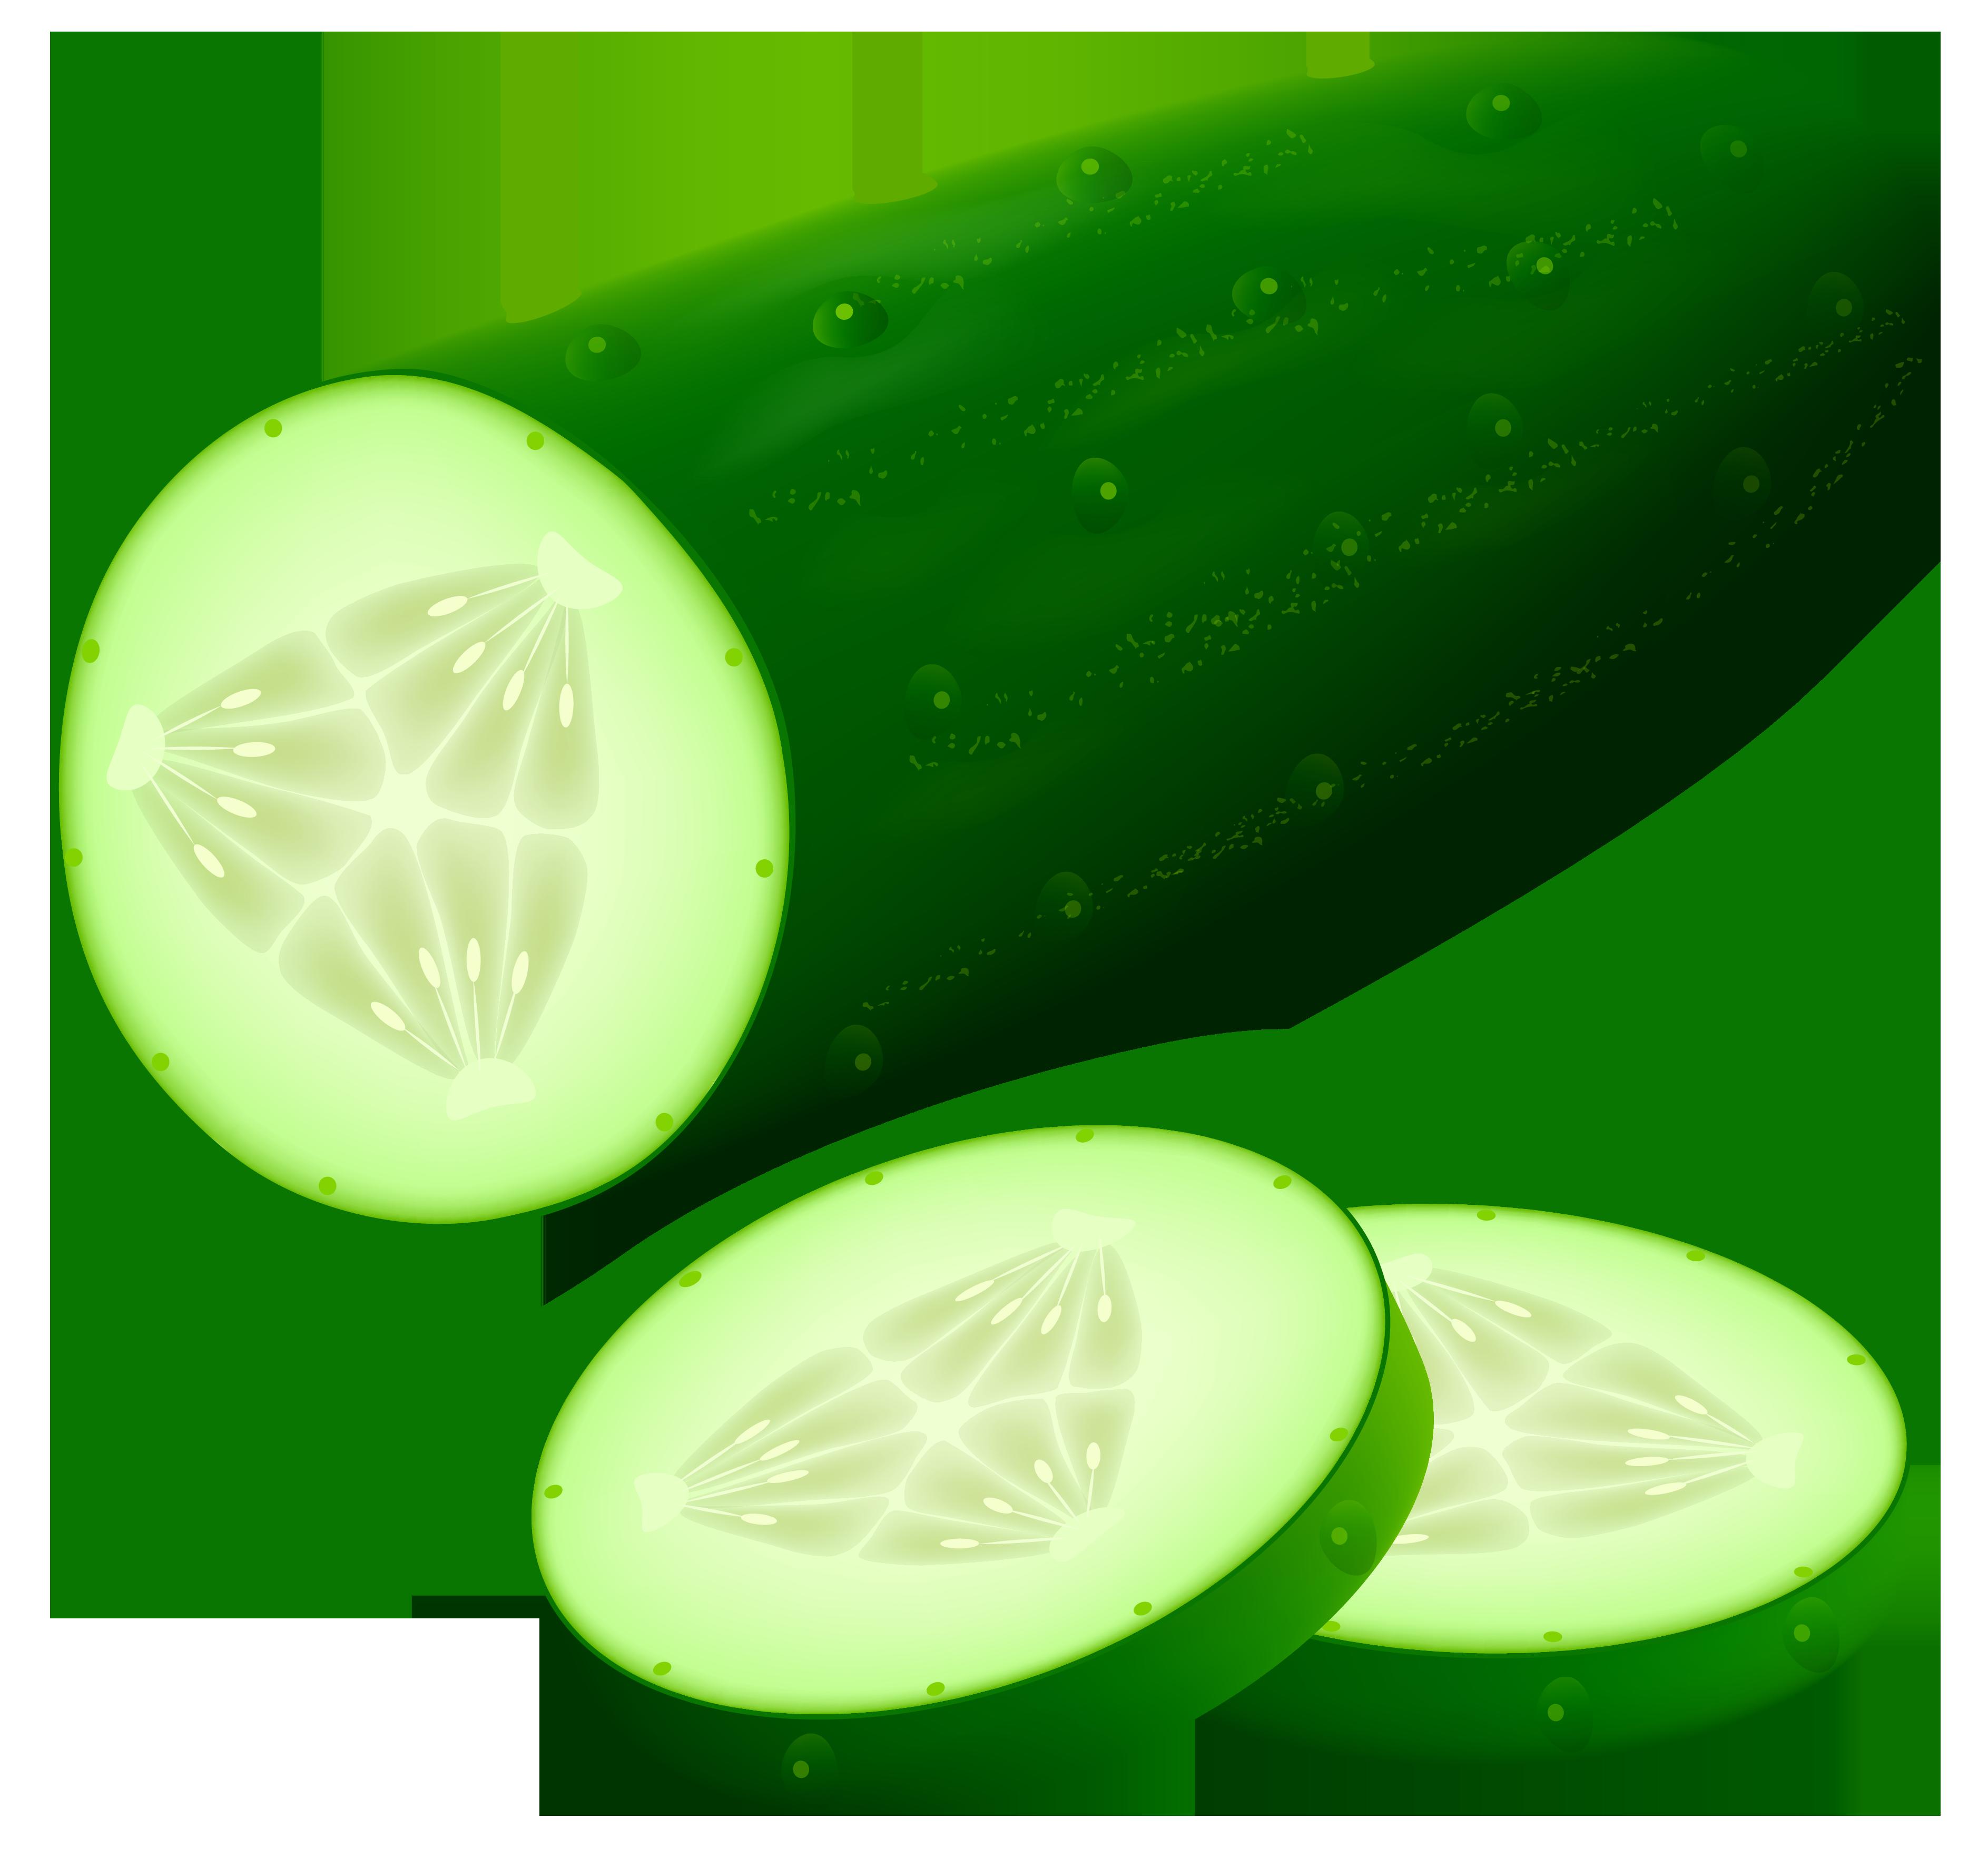 Cucumber clipart image web